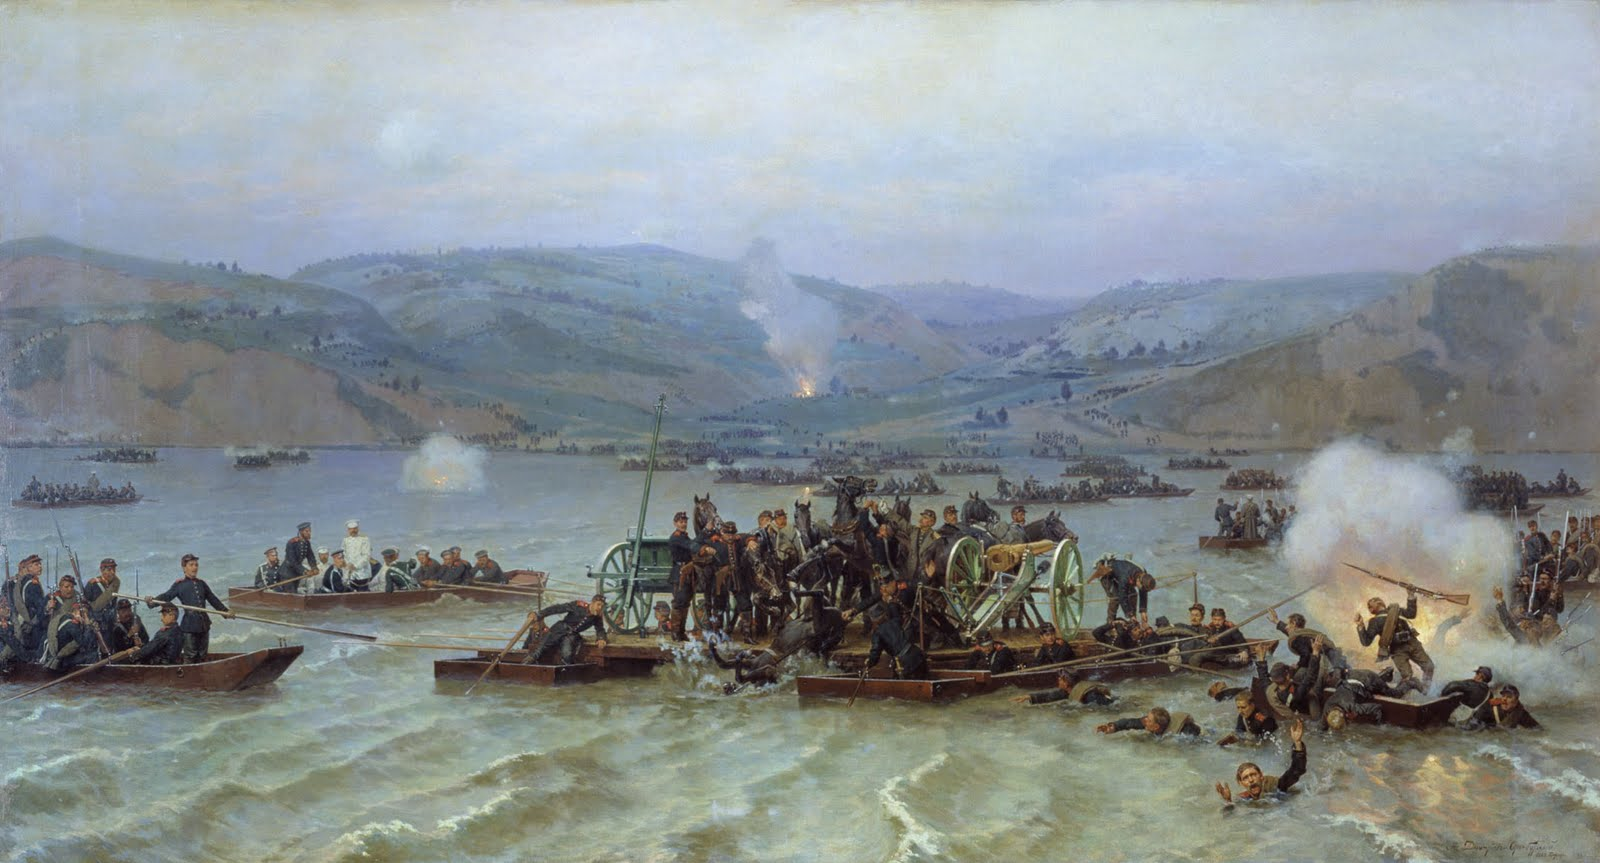 Guerras Russo-turcas